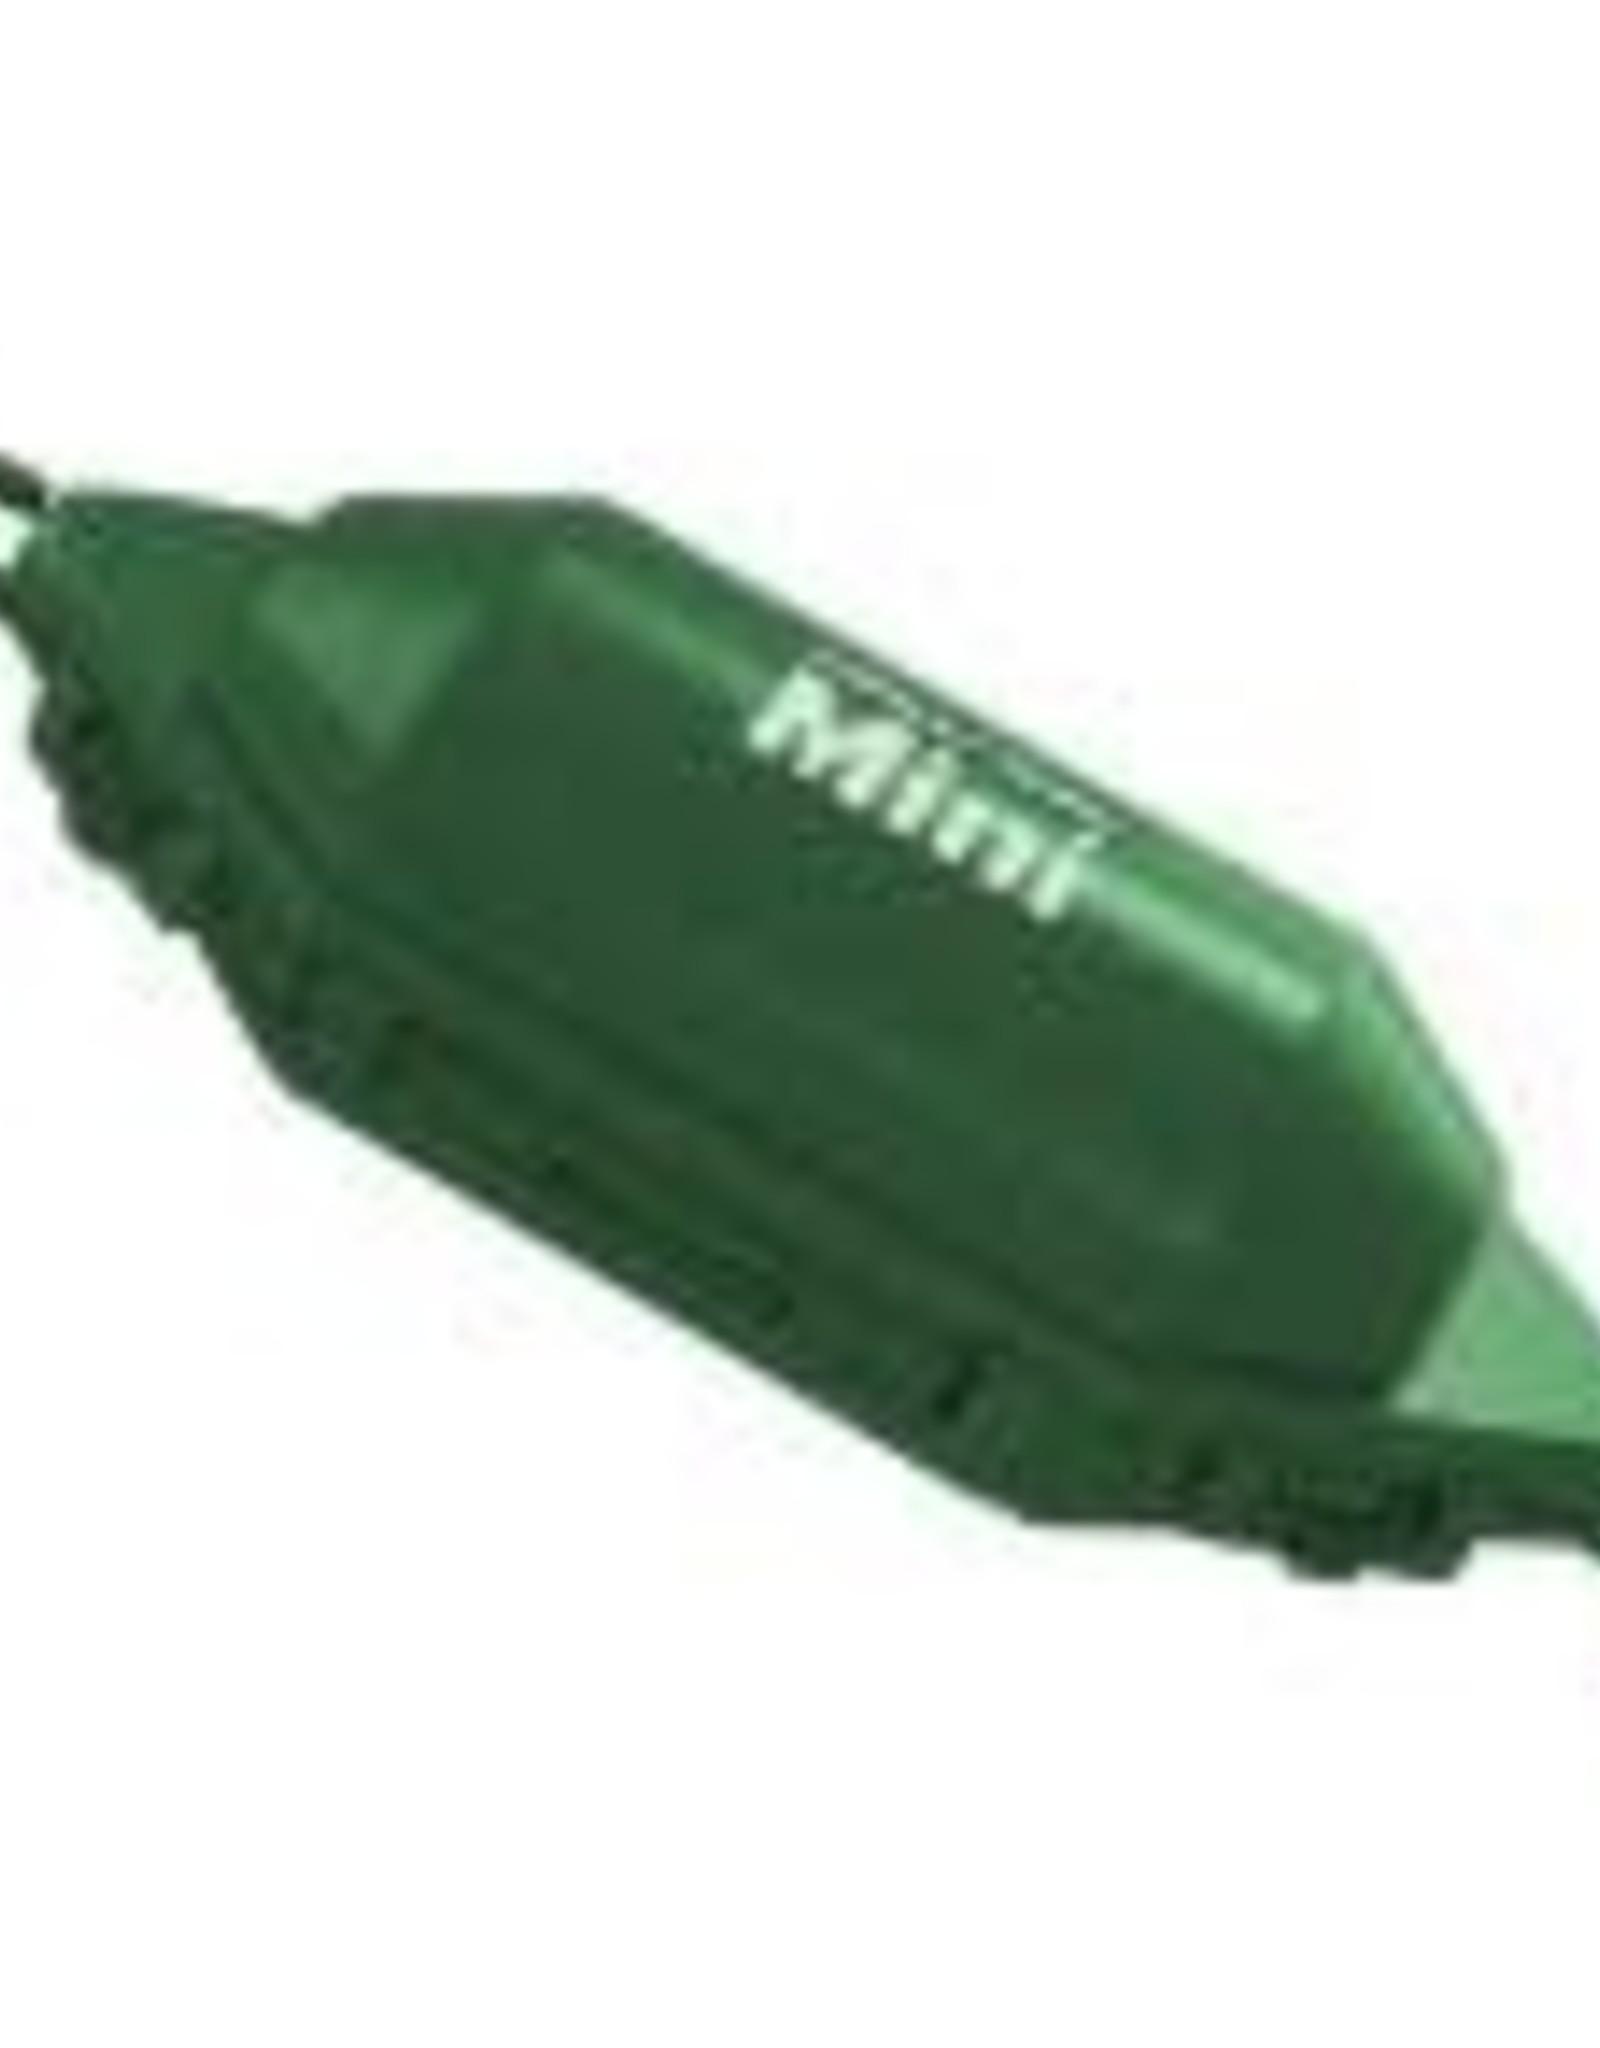 Twist and Seal Mini Holiday and Christmas Light Cord Protection and Plug Cover